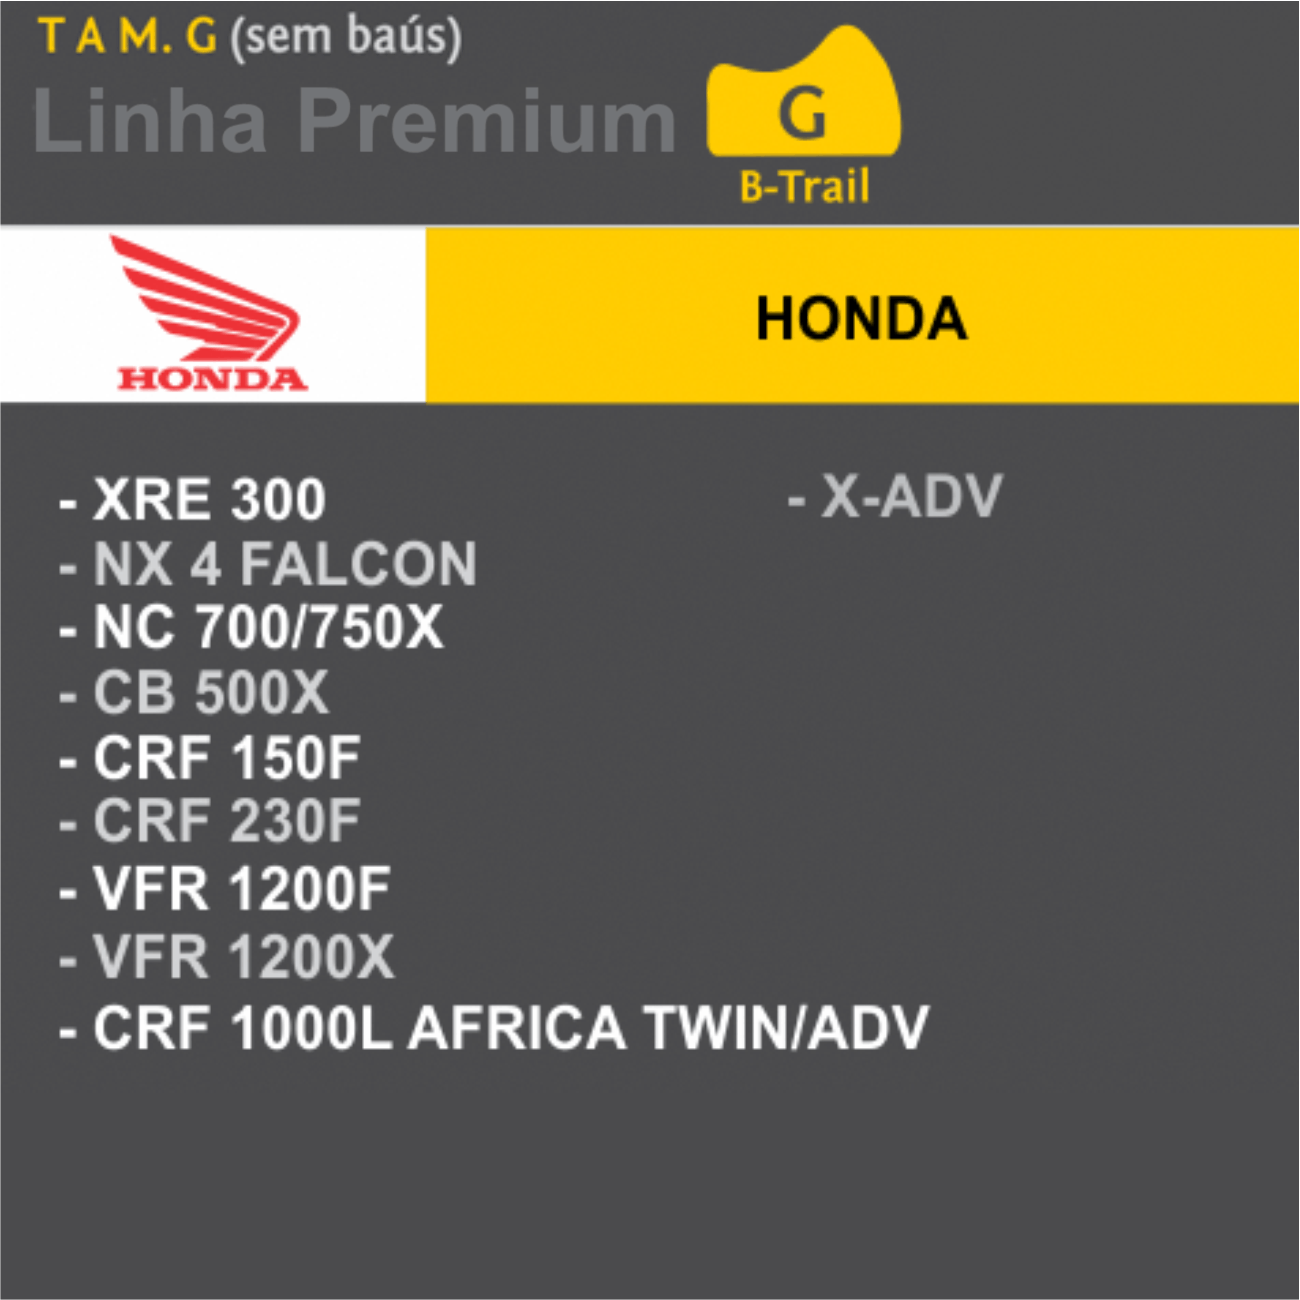 Capa Para Moto Premium Honda Tam. G (permeavel)